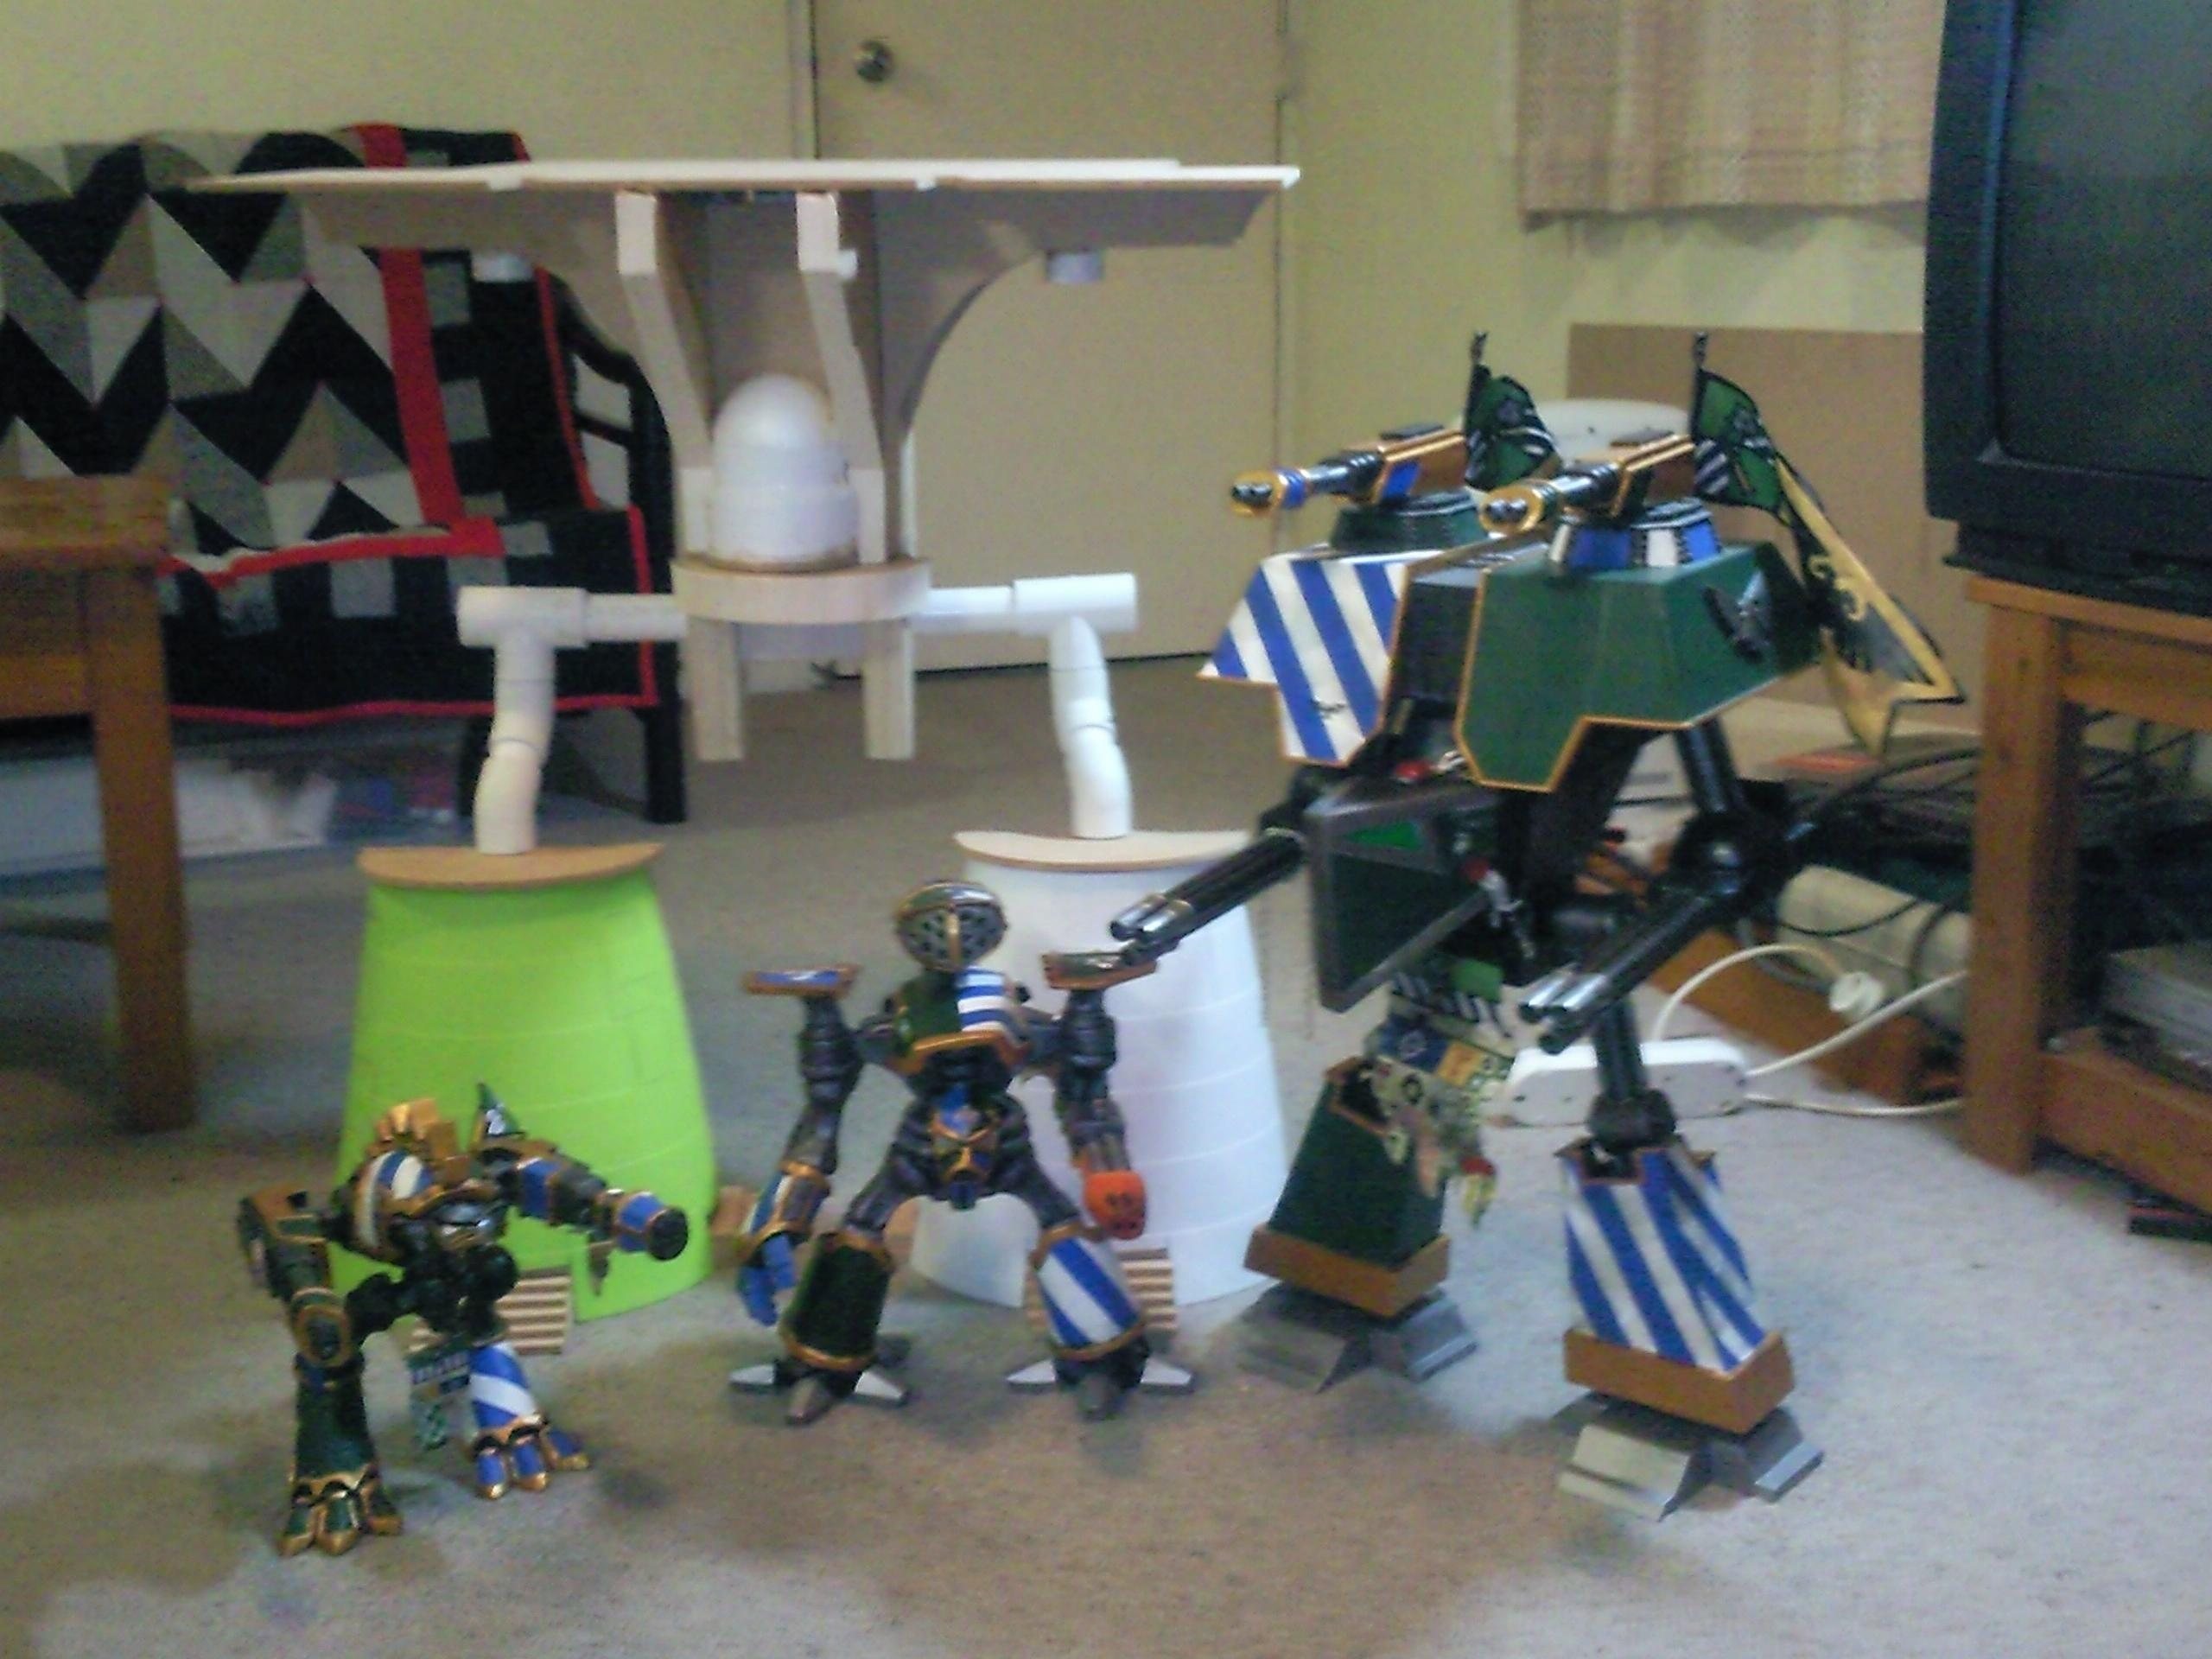 Emperor Titan, Imperiator, Reaver, Titan, Warhound, Warlord